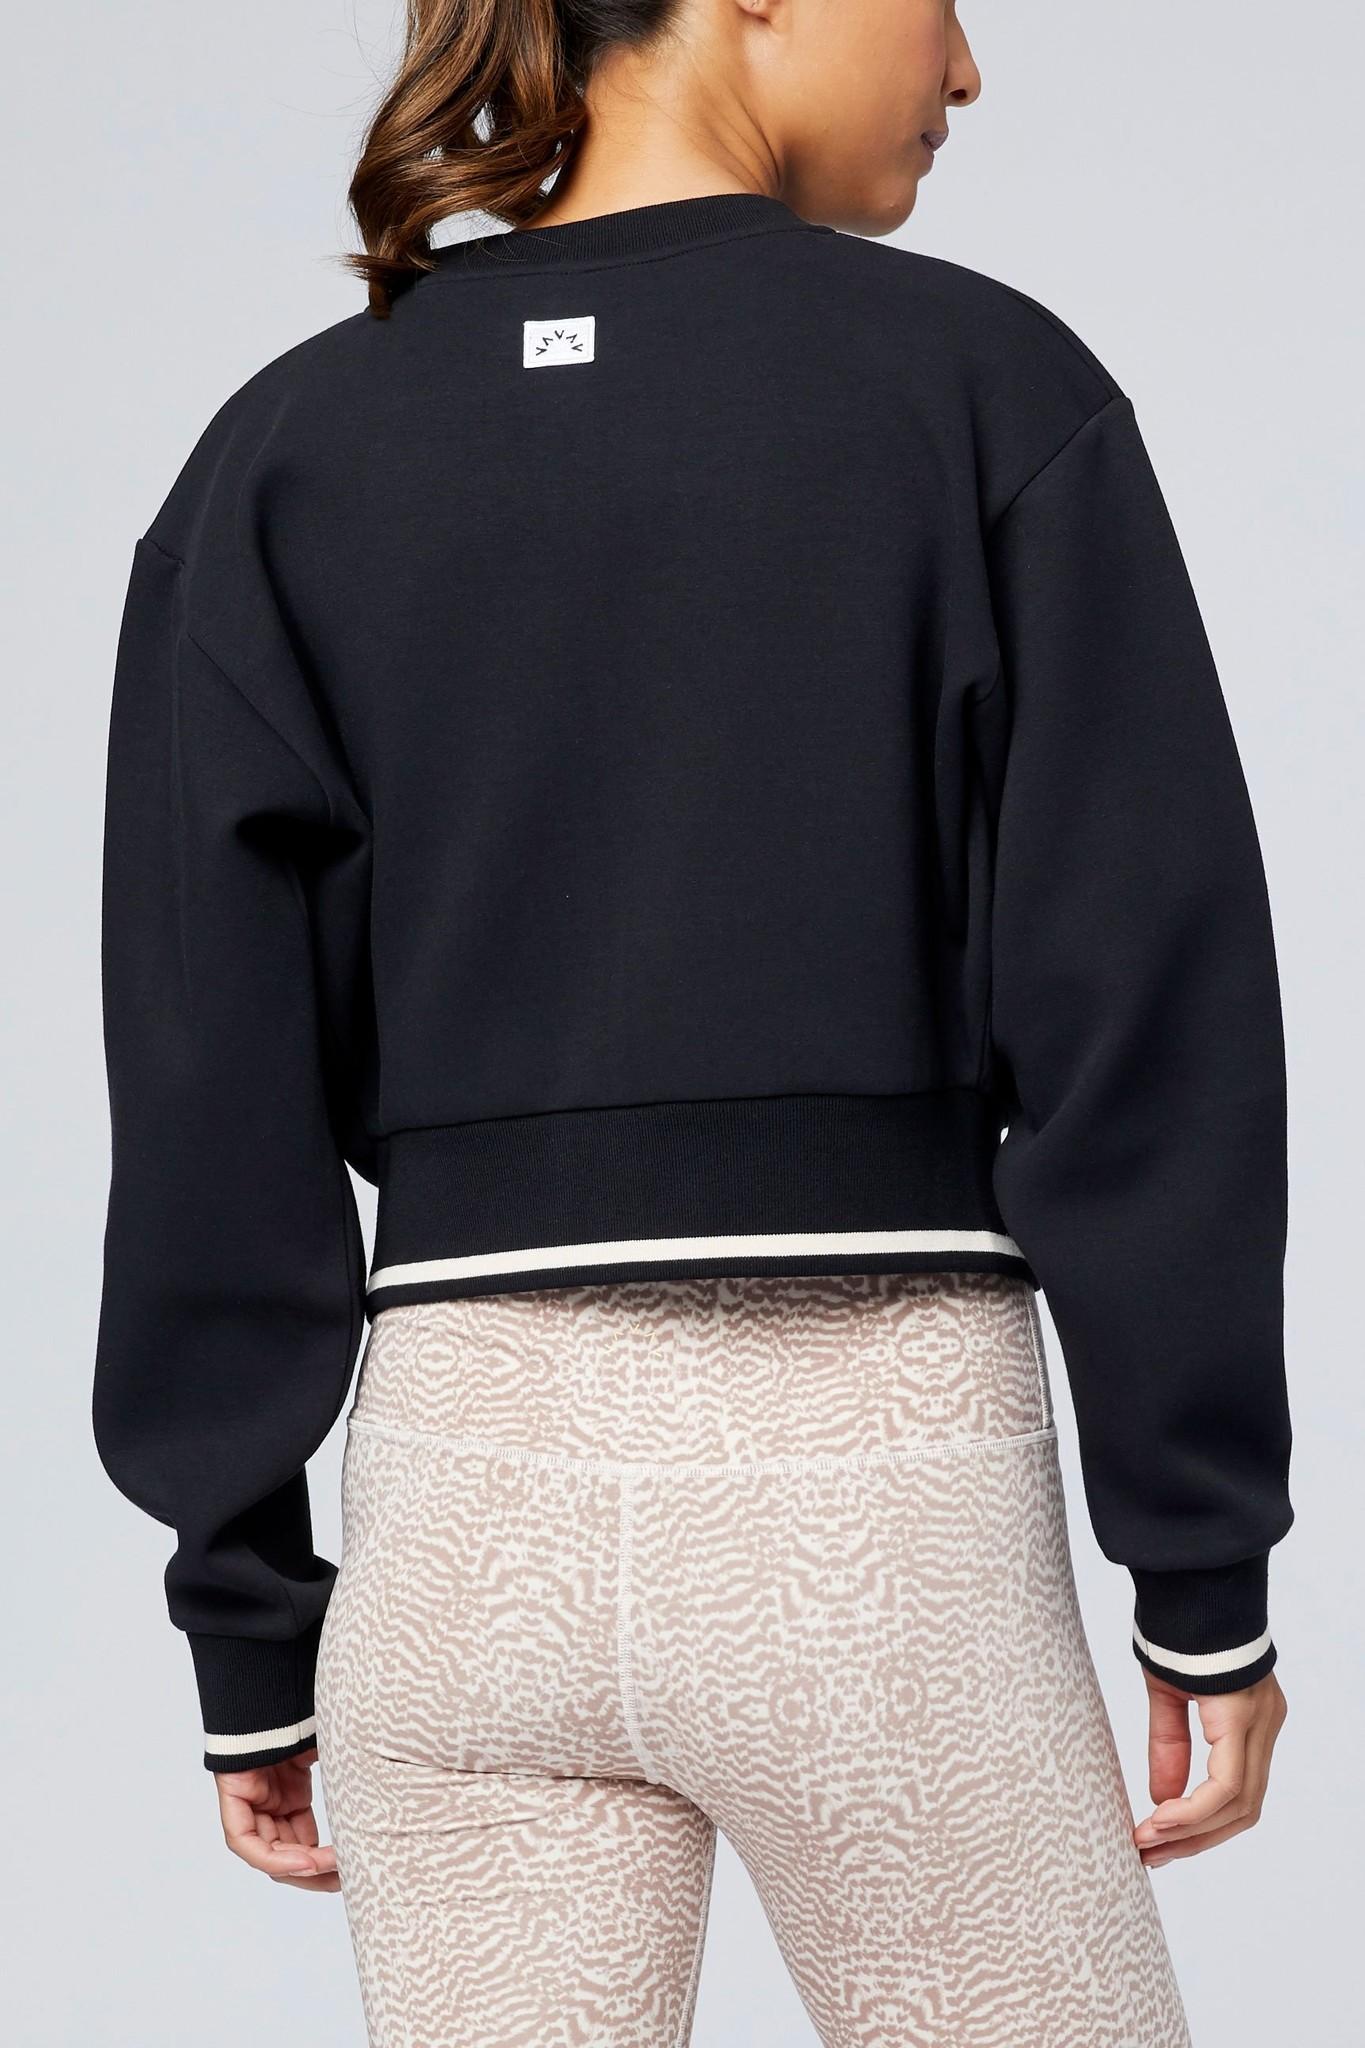 Varley Cole Jacket Black